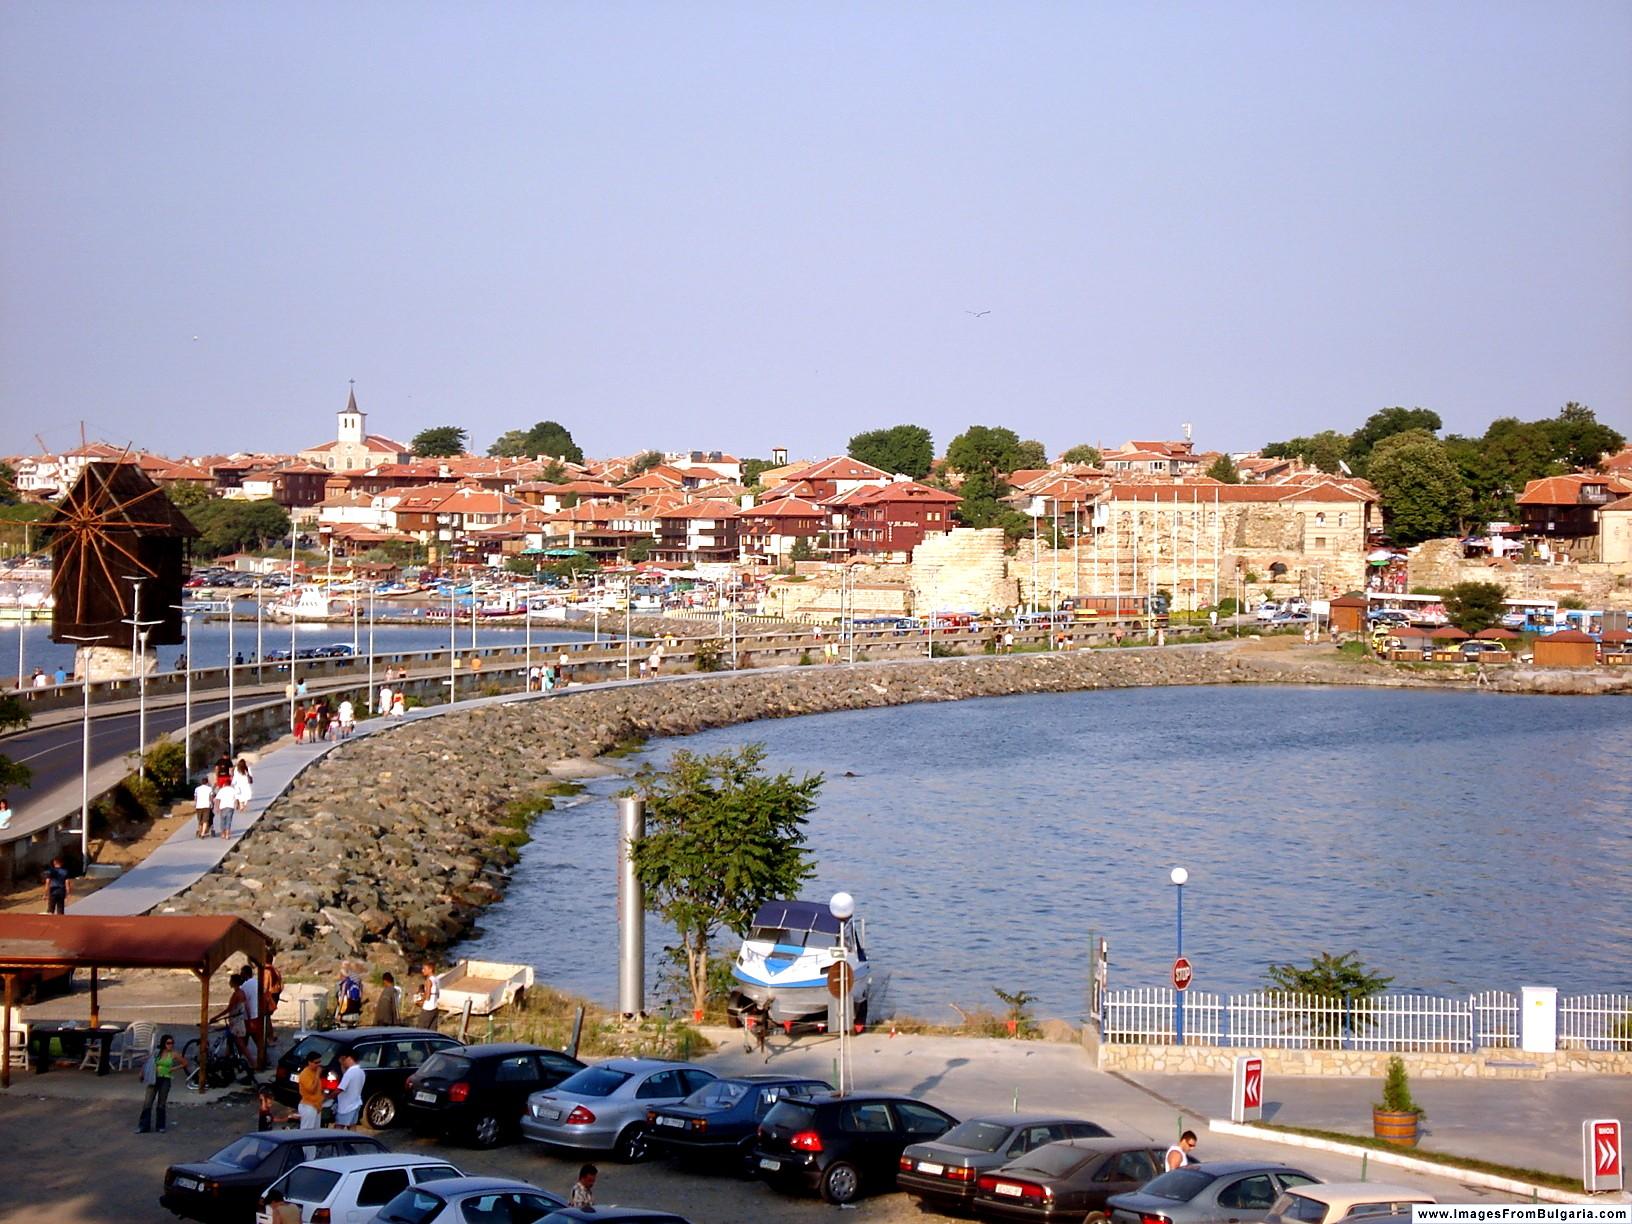 Nessebar Bulgaria  city images : Original file  1,632 × 1,224 pixels, file size: 574 KB, MIME type ...